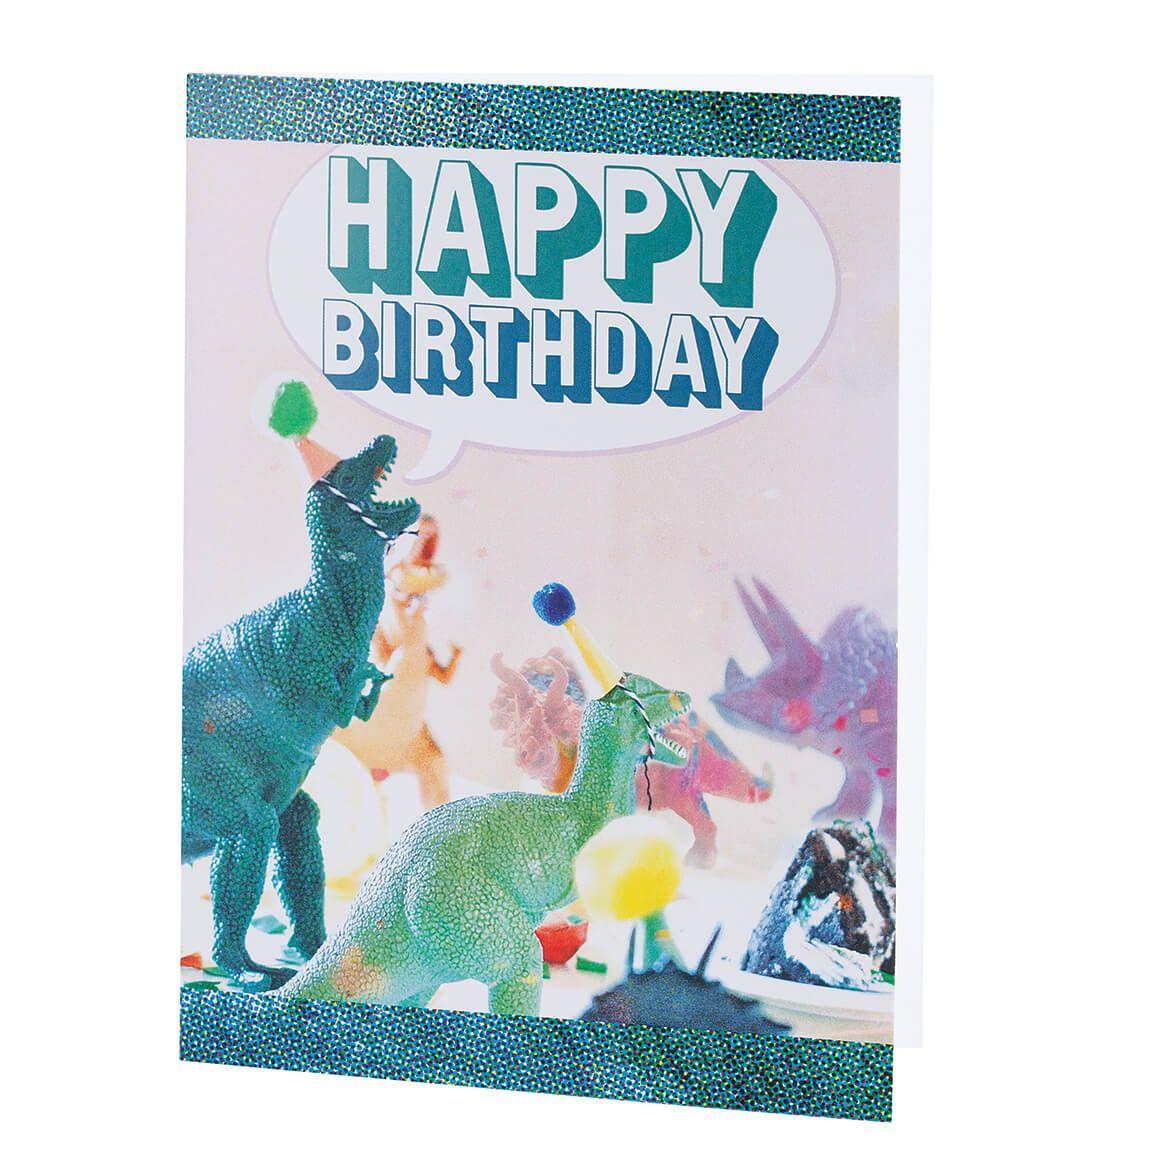 Childrens Birthday Card Variety Pack, Set of 20-372527